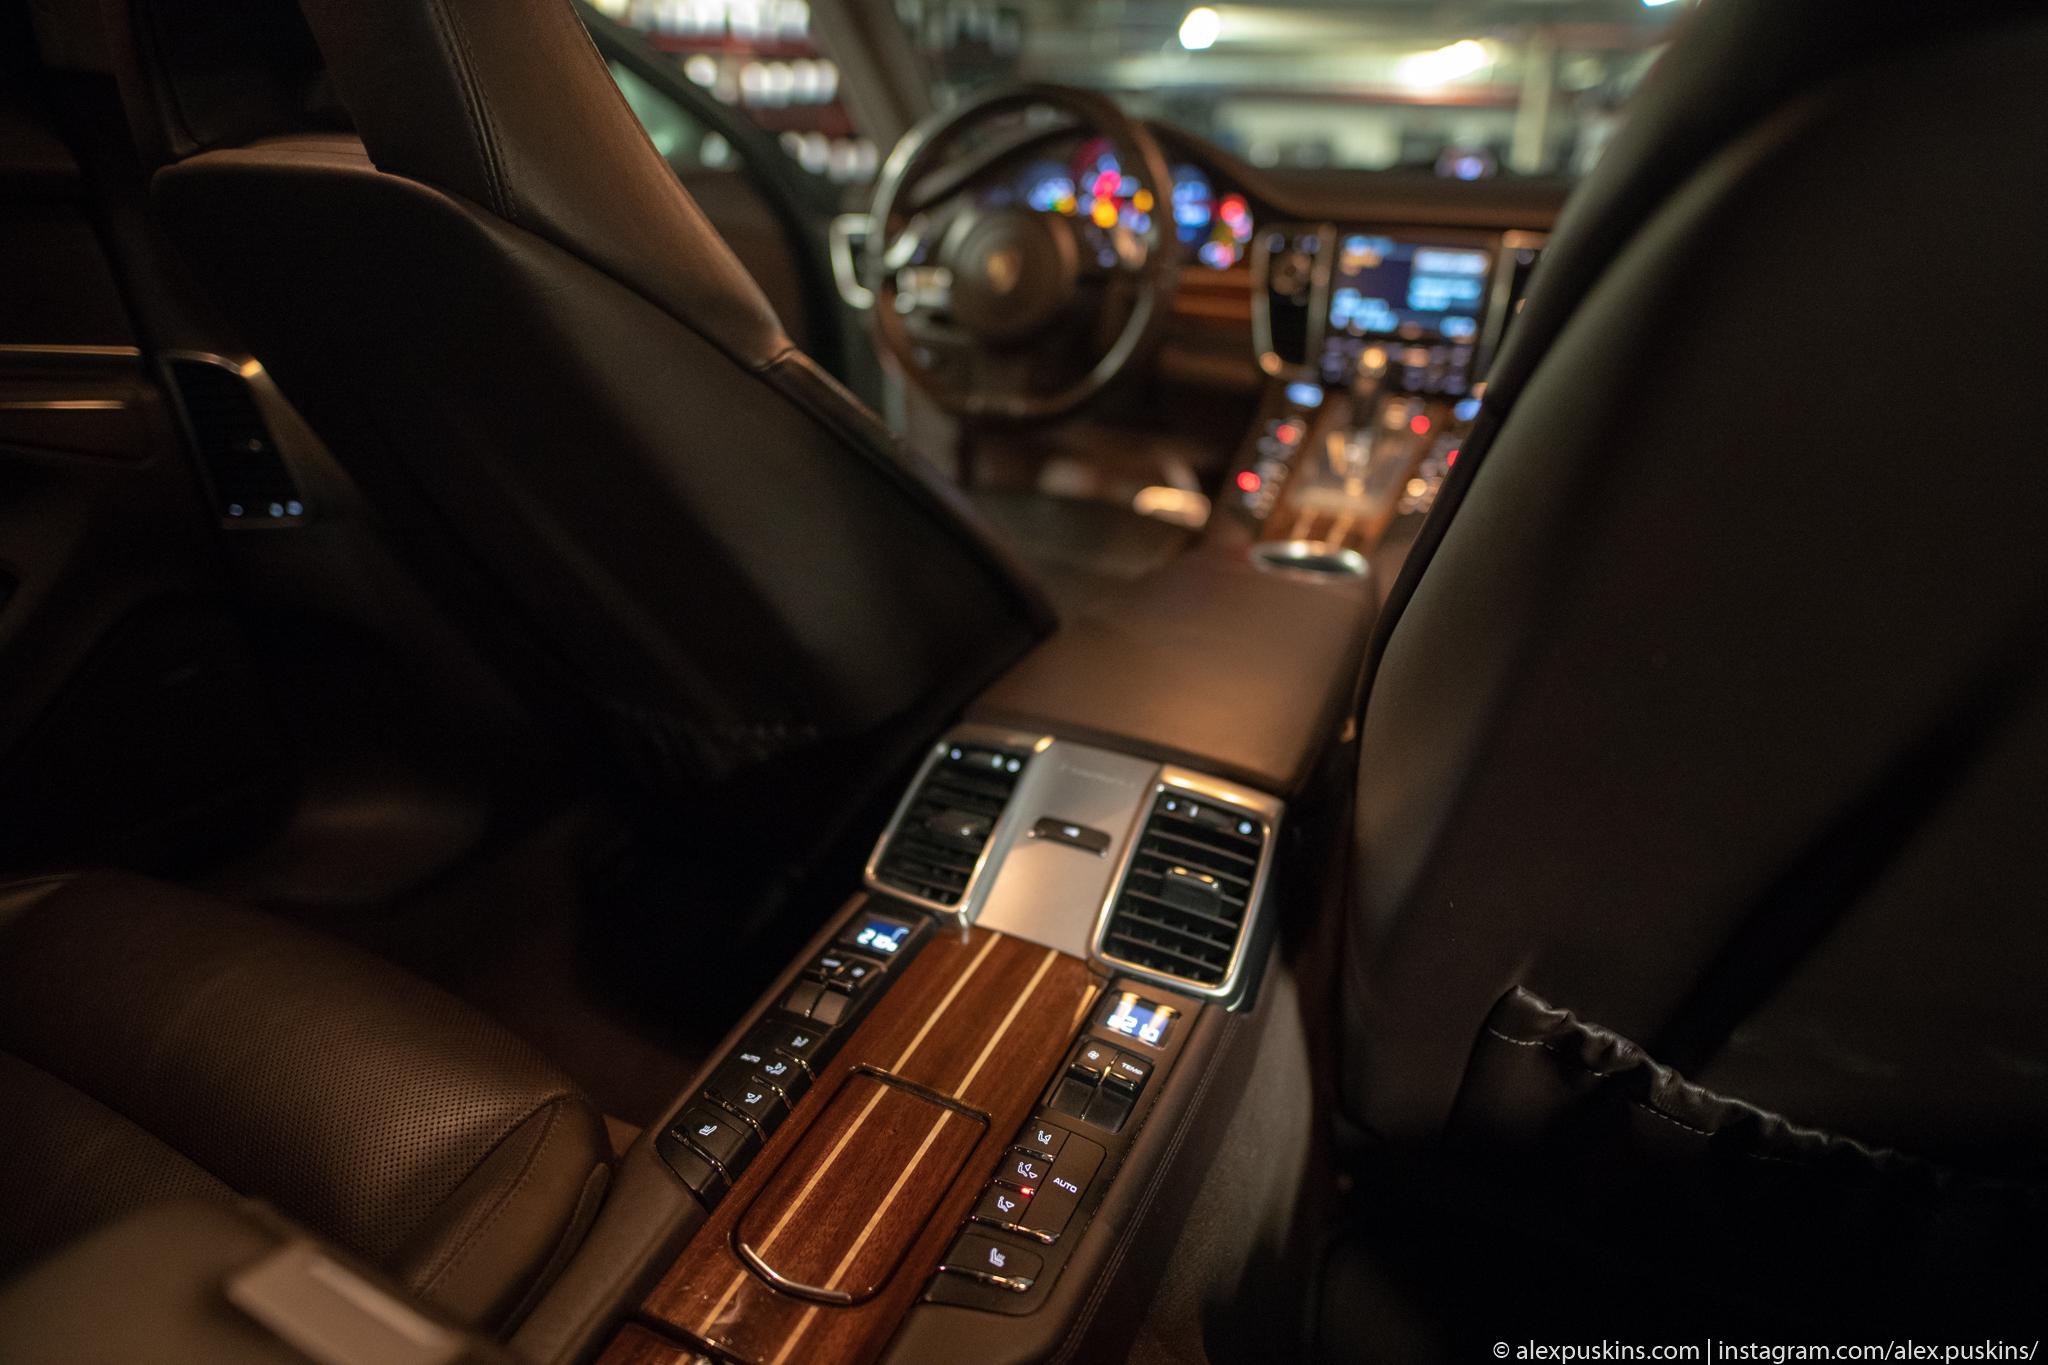 Aктуaльныe новости про Ford и Opel на веб-ресурсе Autobrands.lv